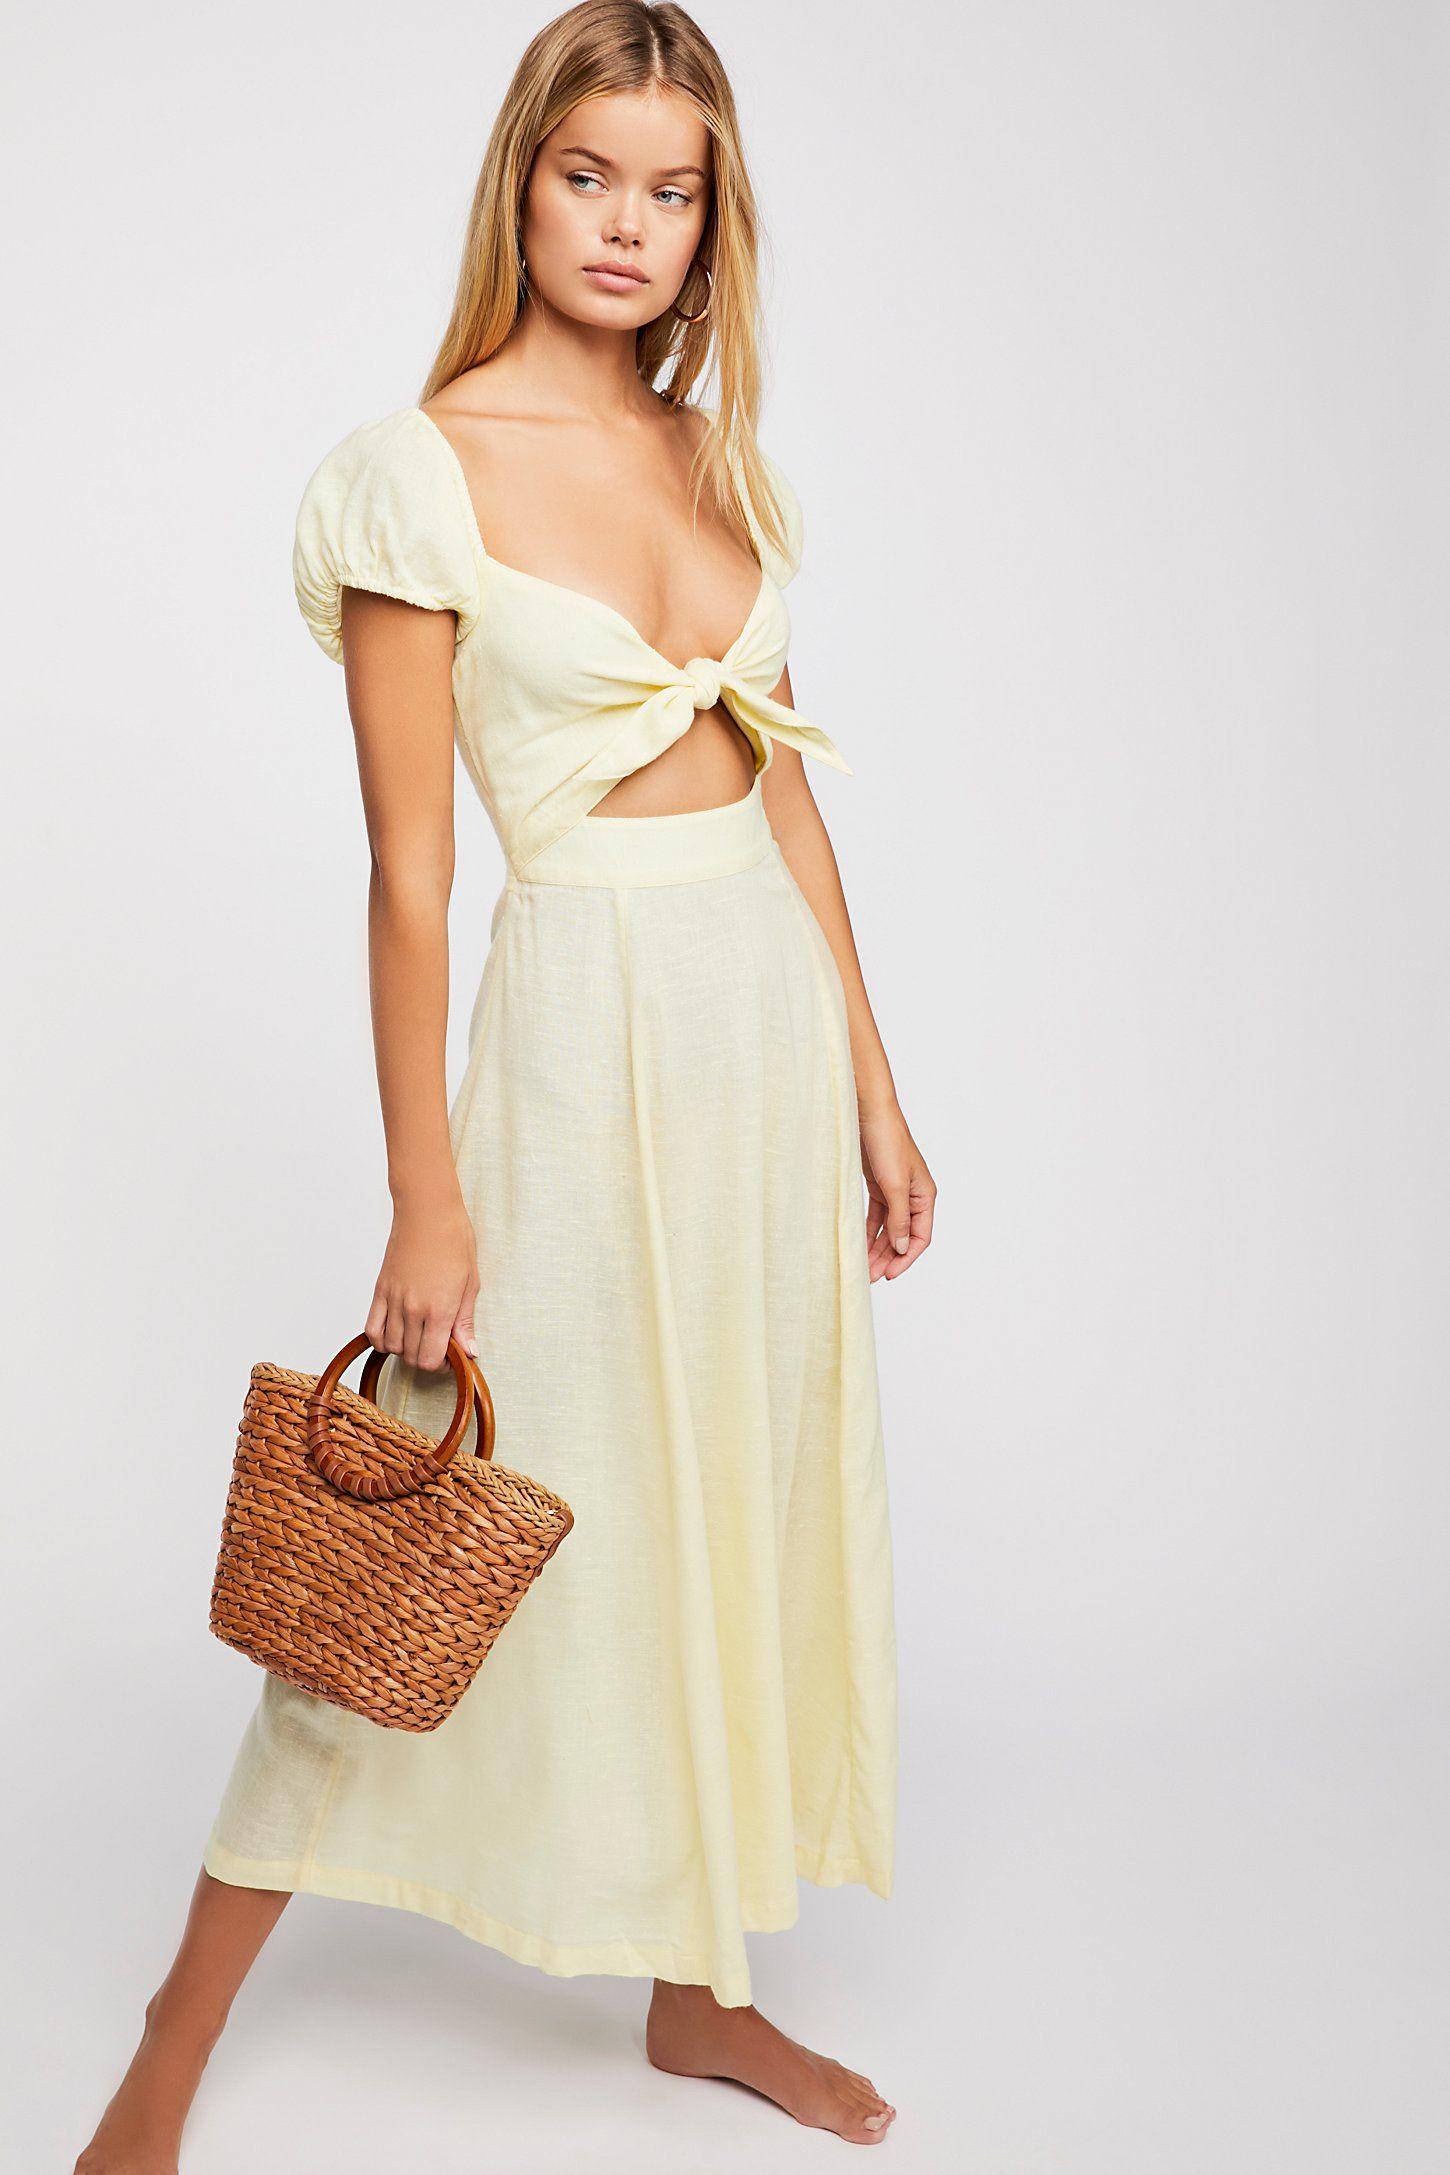 b14763ce6752 The Getaway Midi Dress | Fashion | Dresses, Free people, Free people ...